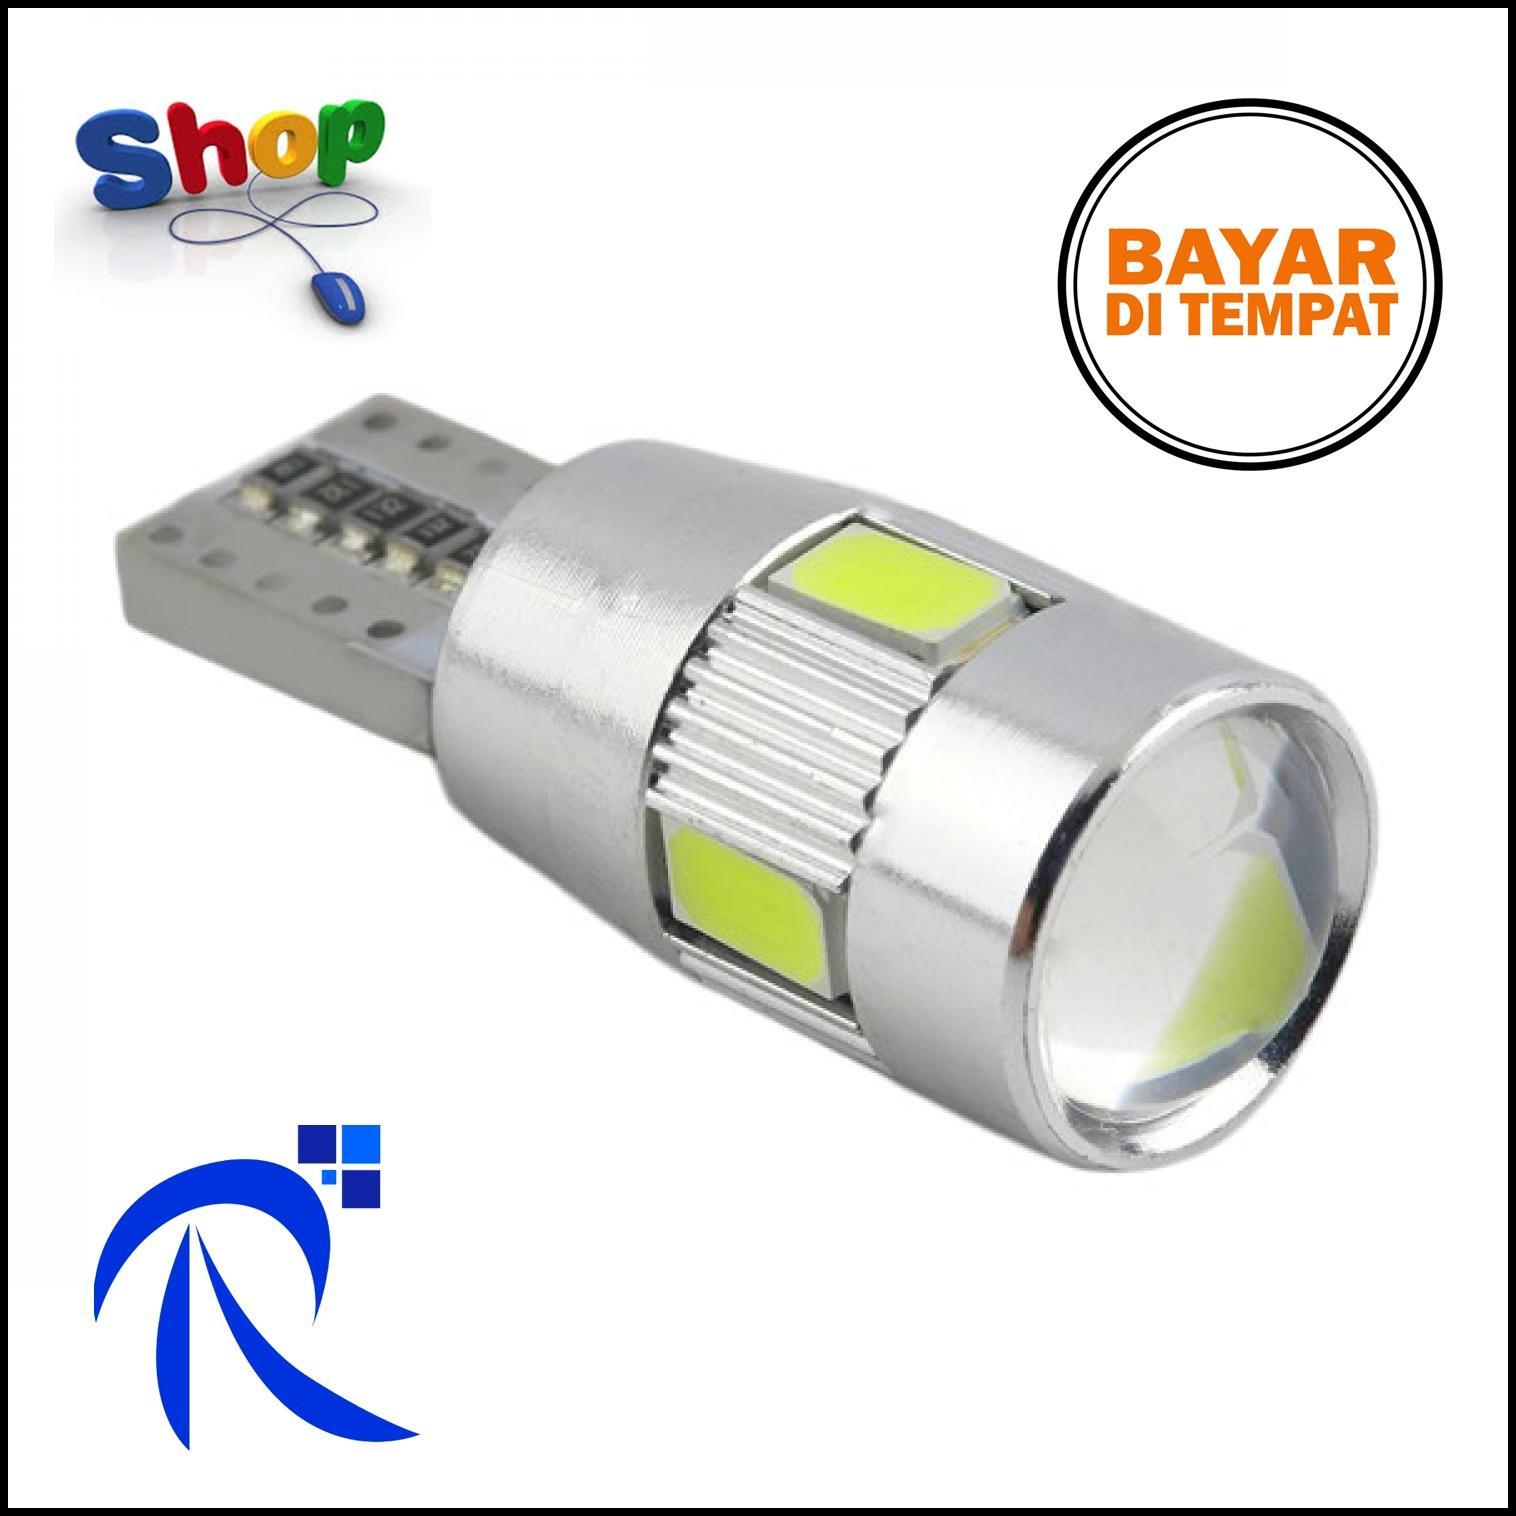 Buy Sell Cheapest 6x6 T10 5630 Best Quality Product Deals Lampu Fog Light Mobil Led H3 Smd 2pcs Rimas Rem W5w White Putih Brake